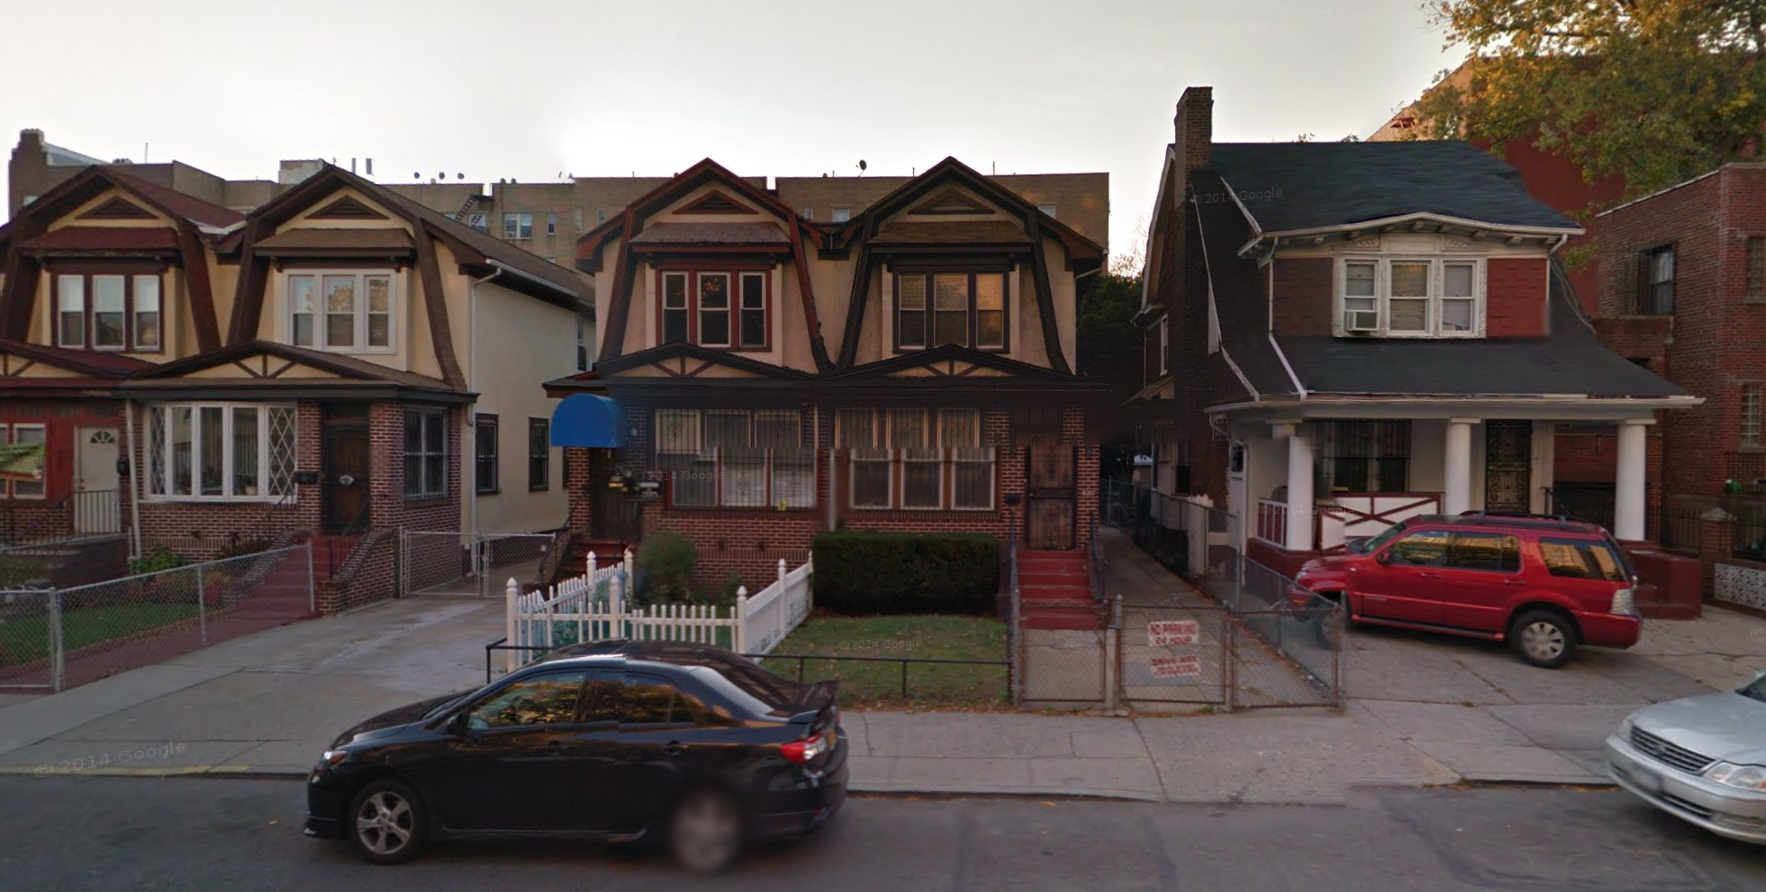 828 New York Avenue, image via Google Maps